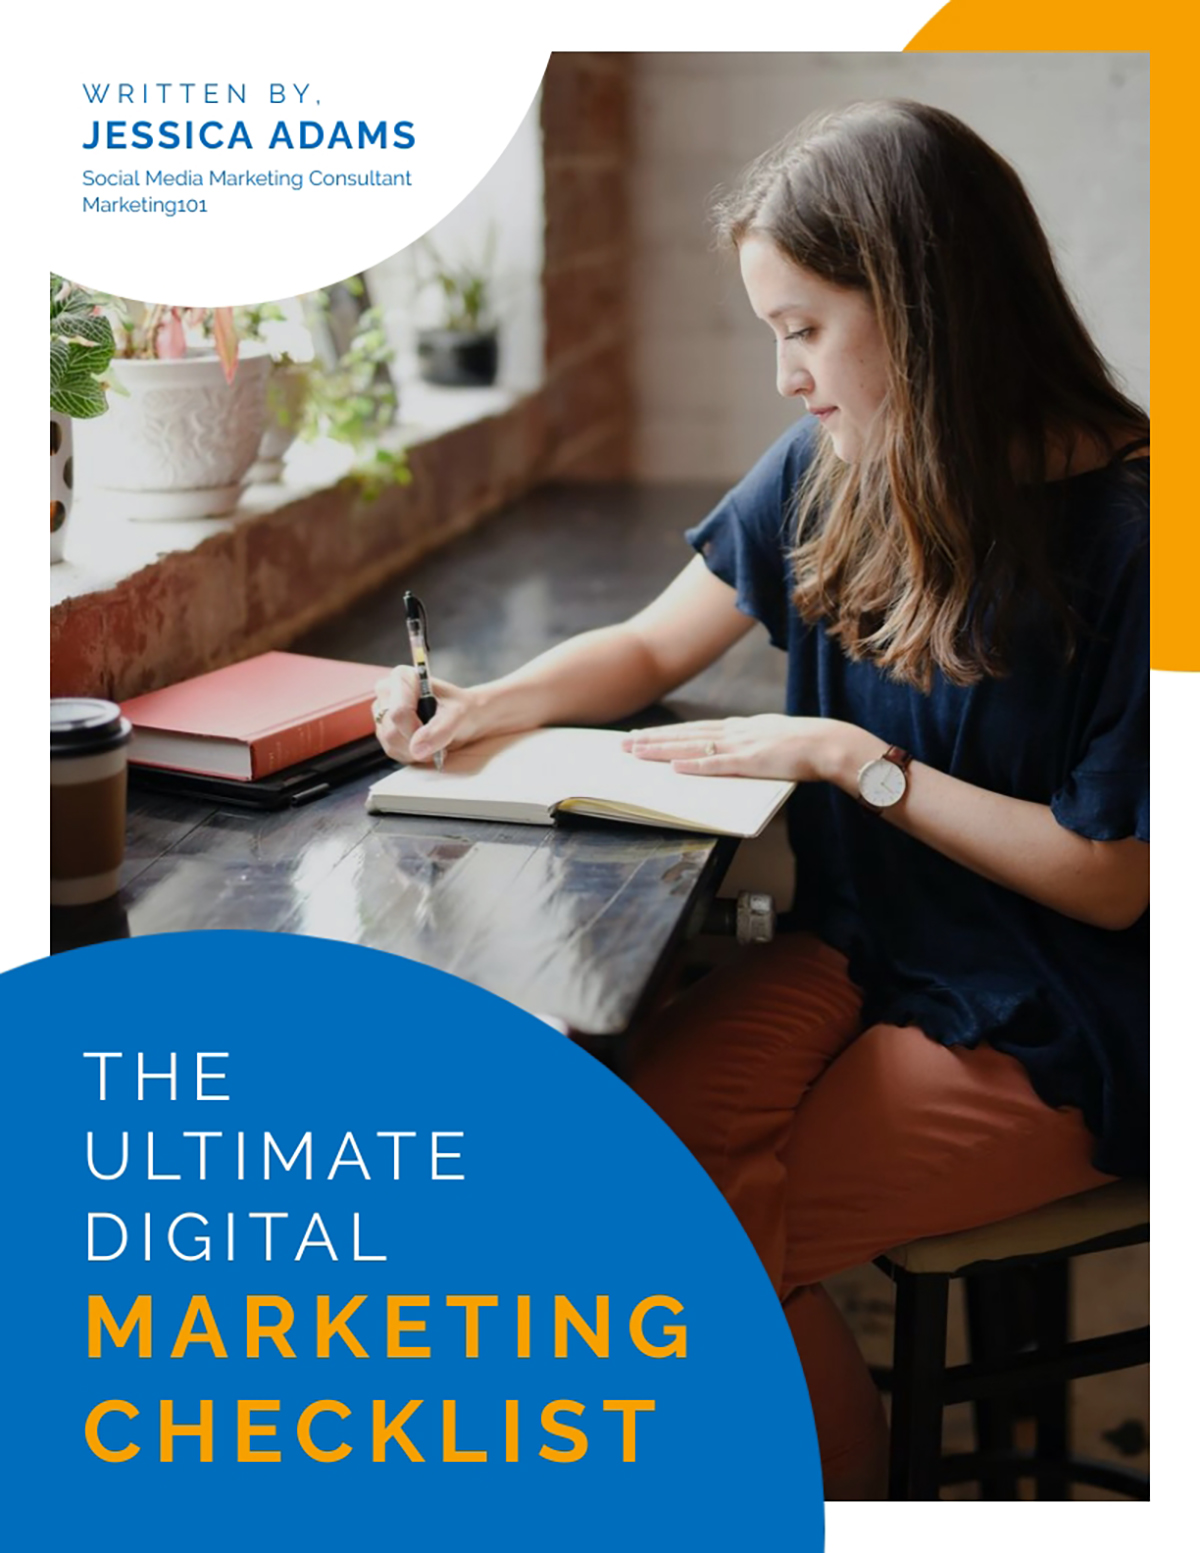 Orange and blue digital marketing checklist template available in Visme.